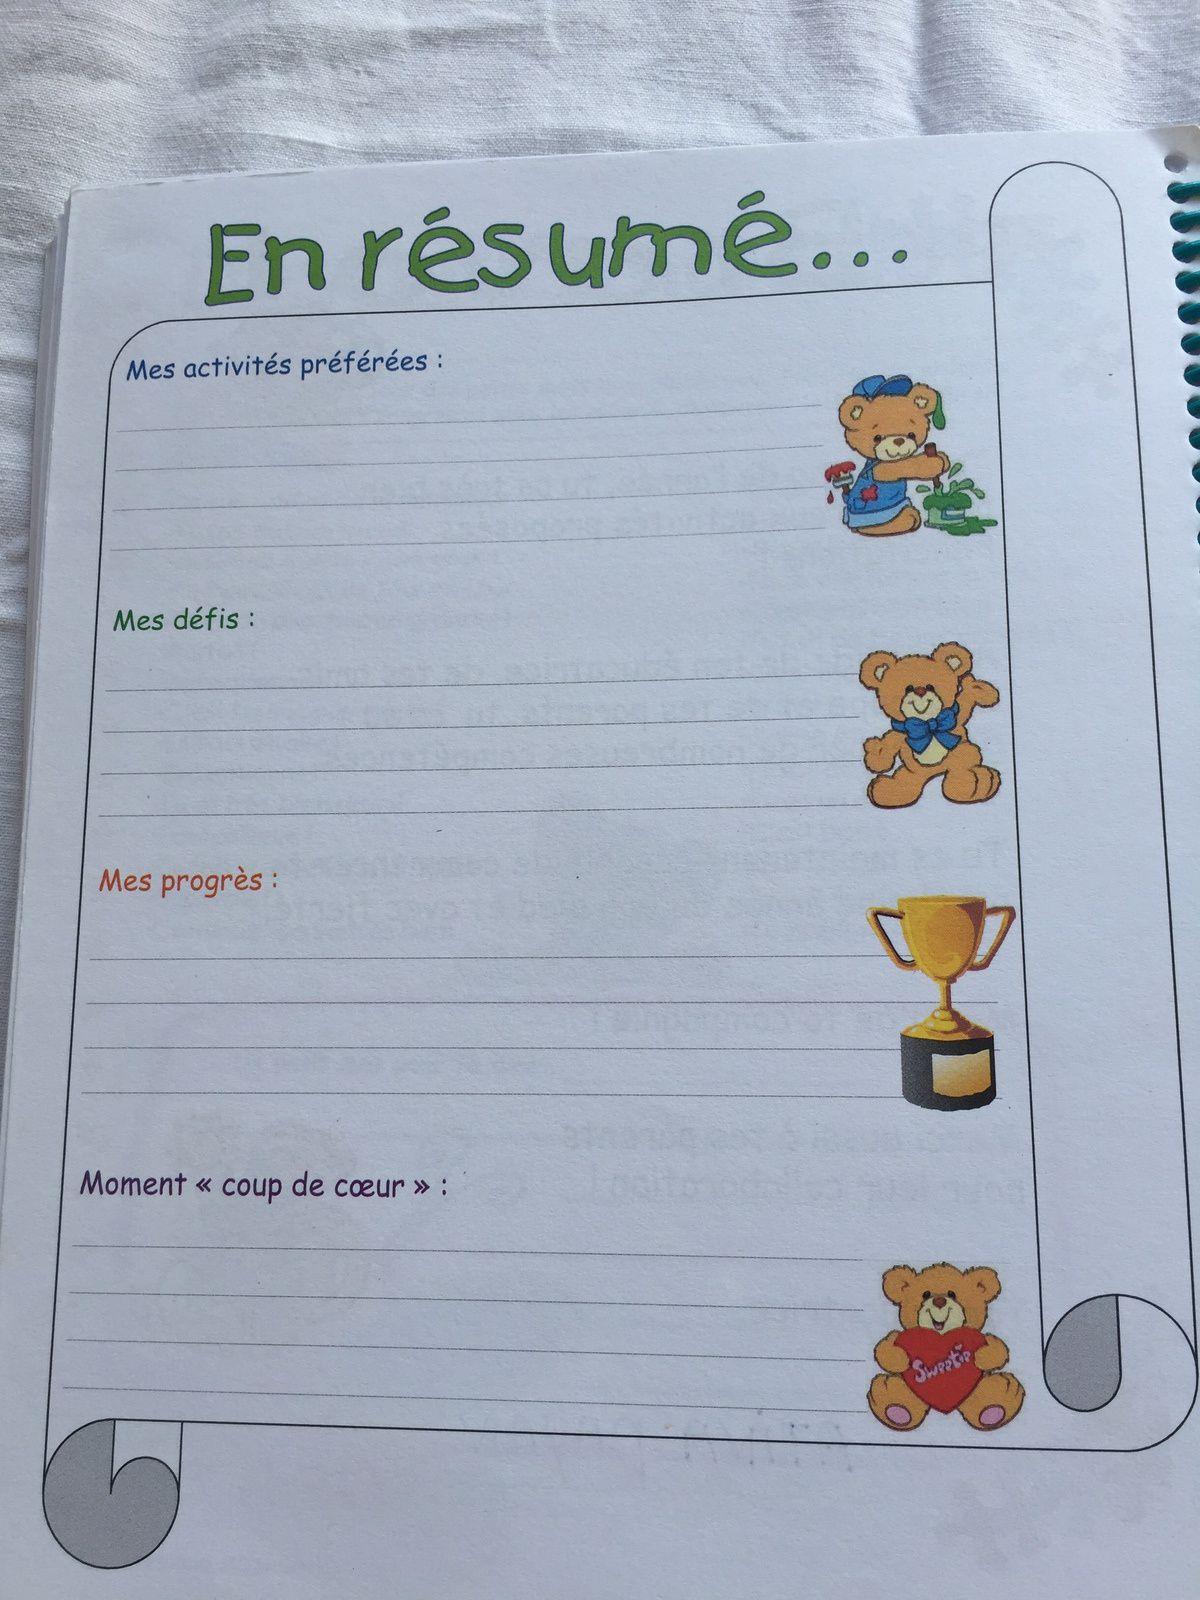 #journaldebord #enfants #carnetdeliason #creche #assistantematernelle #charlotteblabla blog